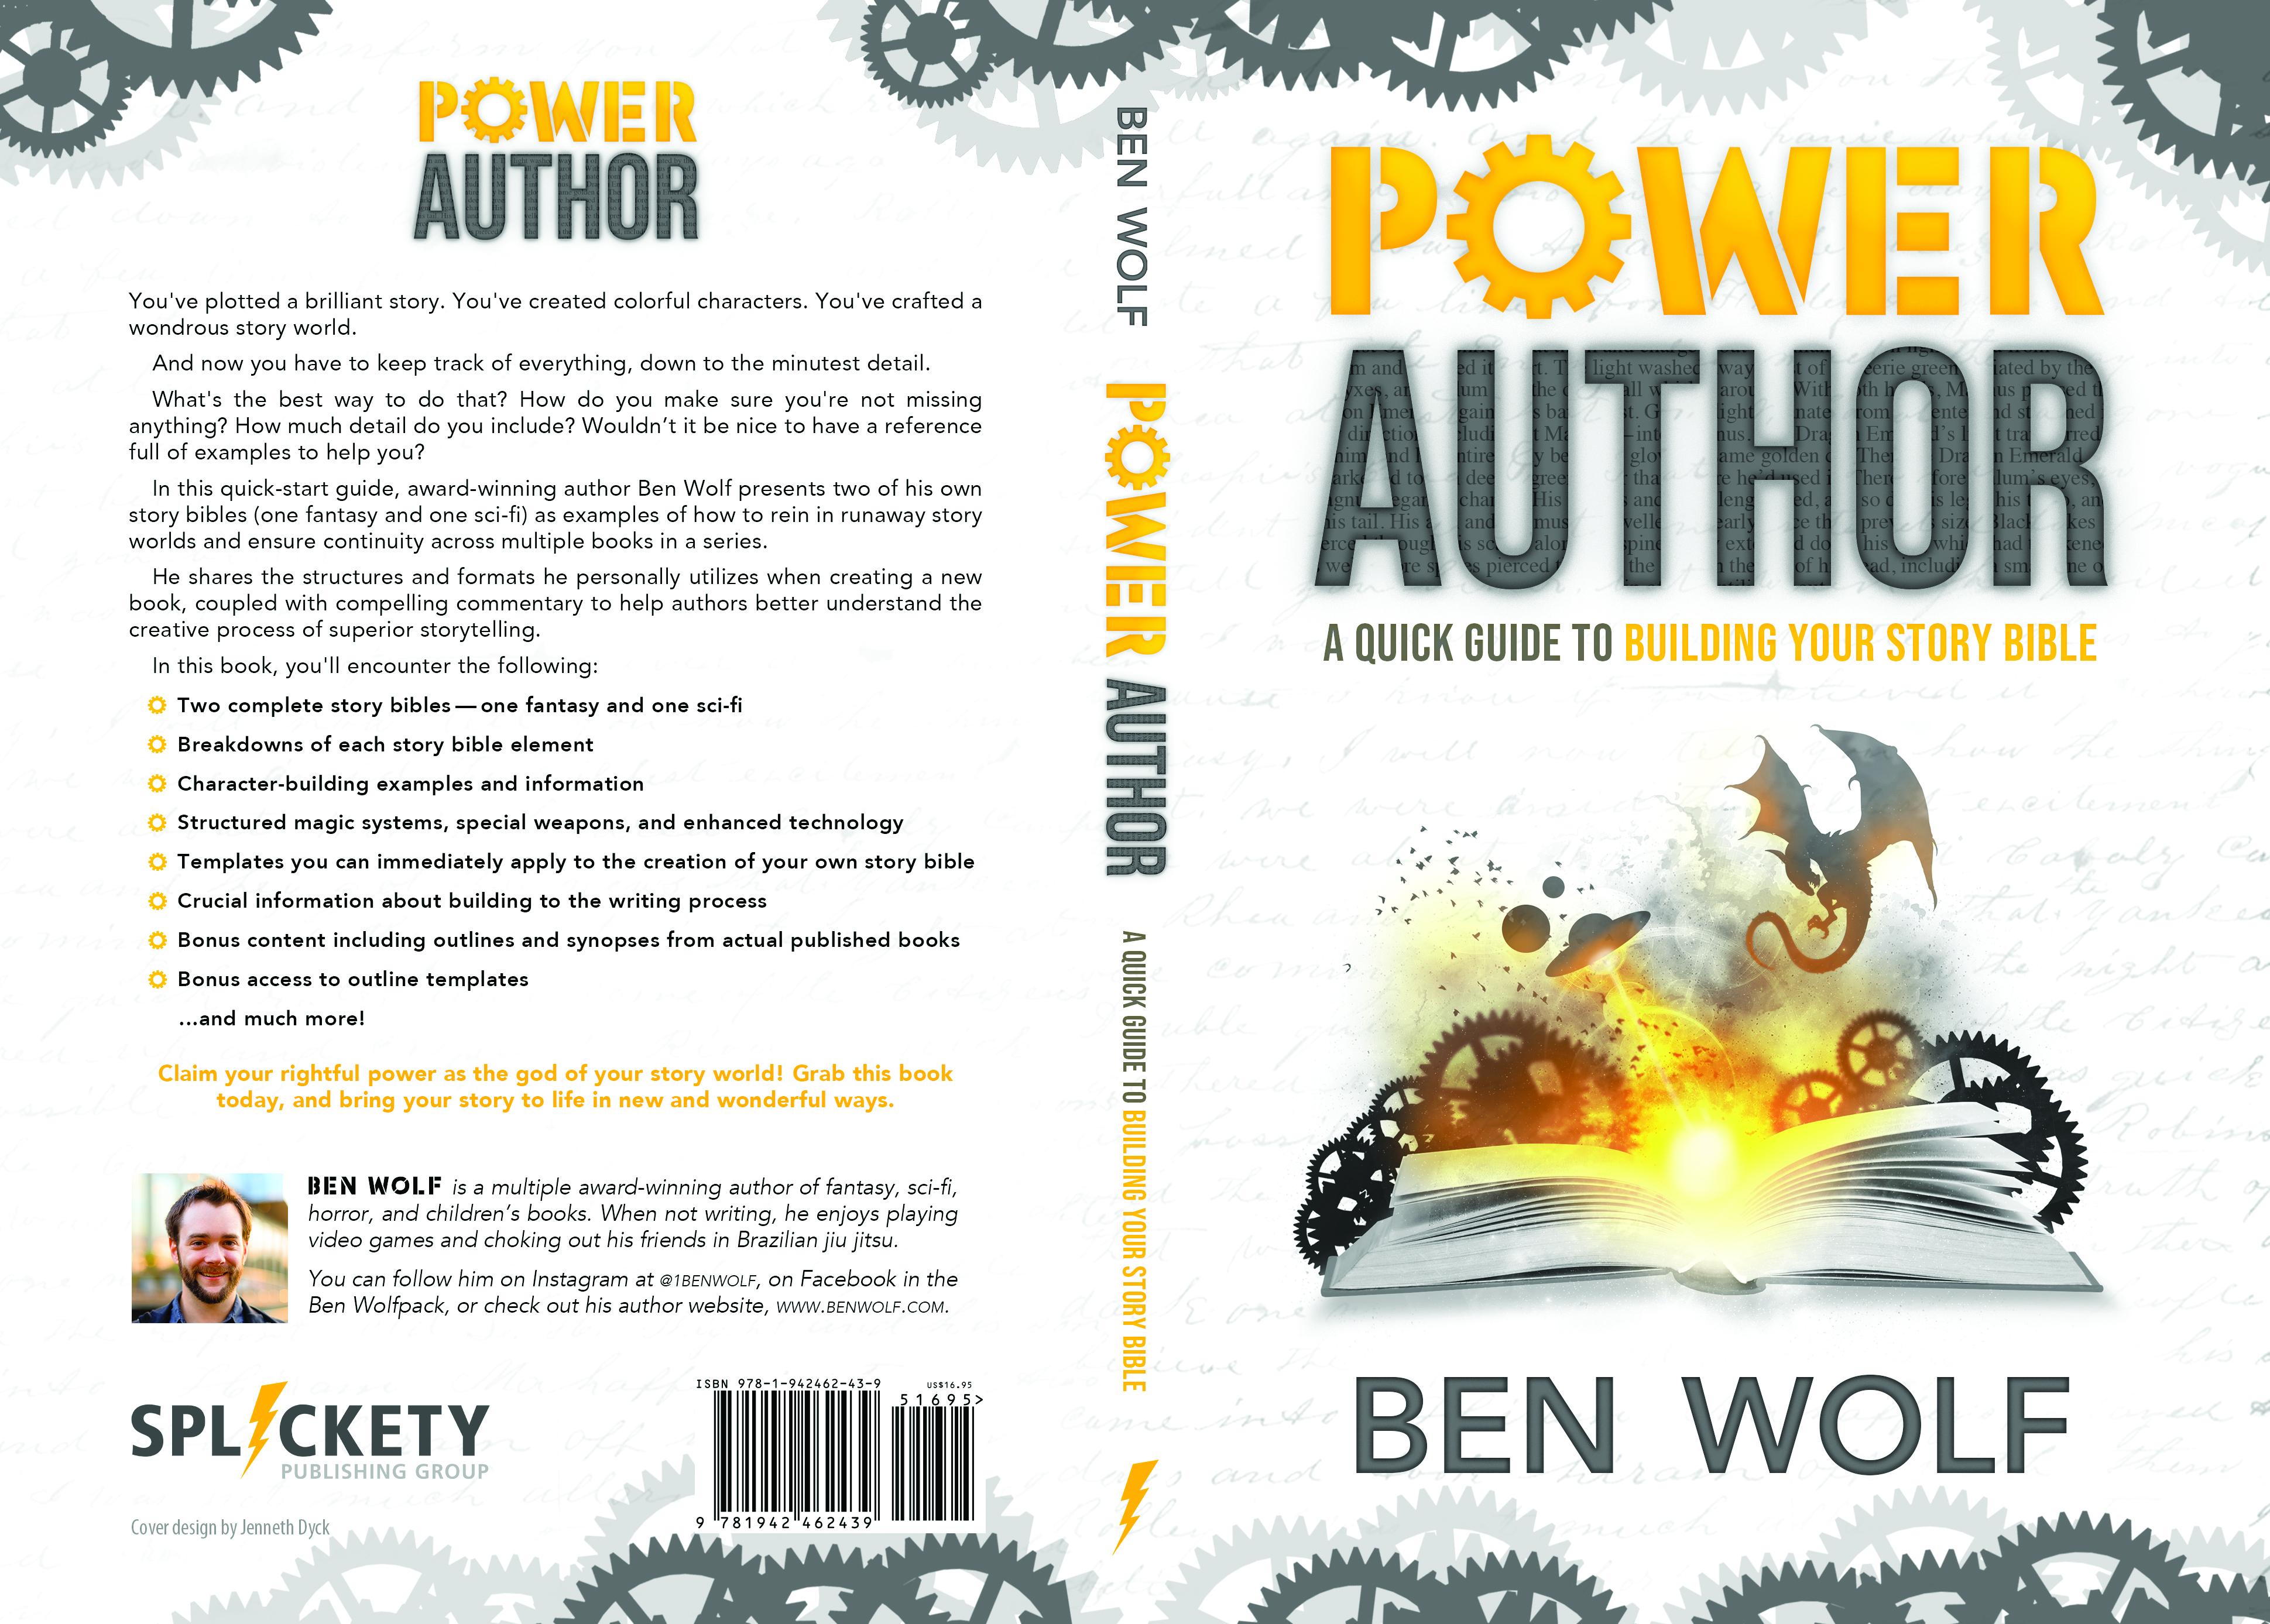 Power Author Amazon CMYK